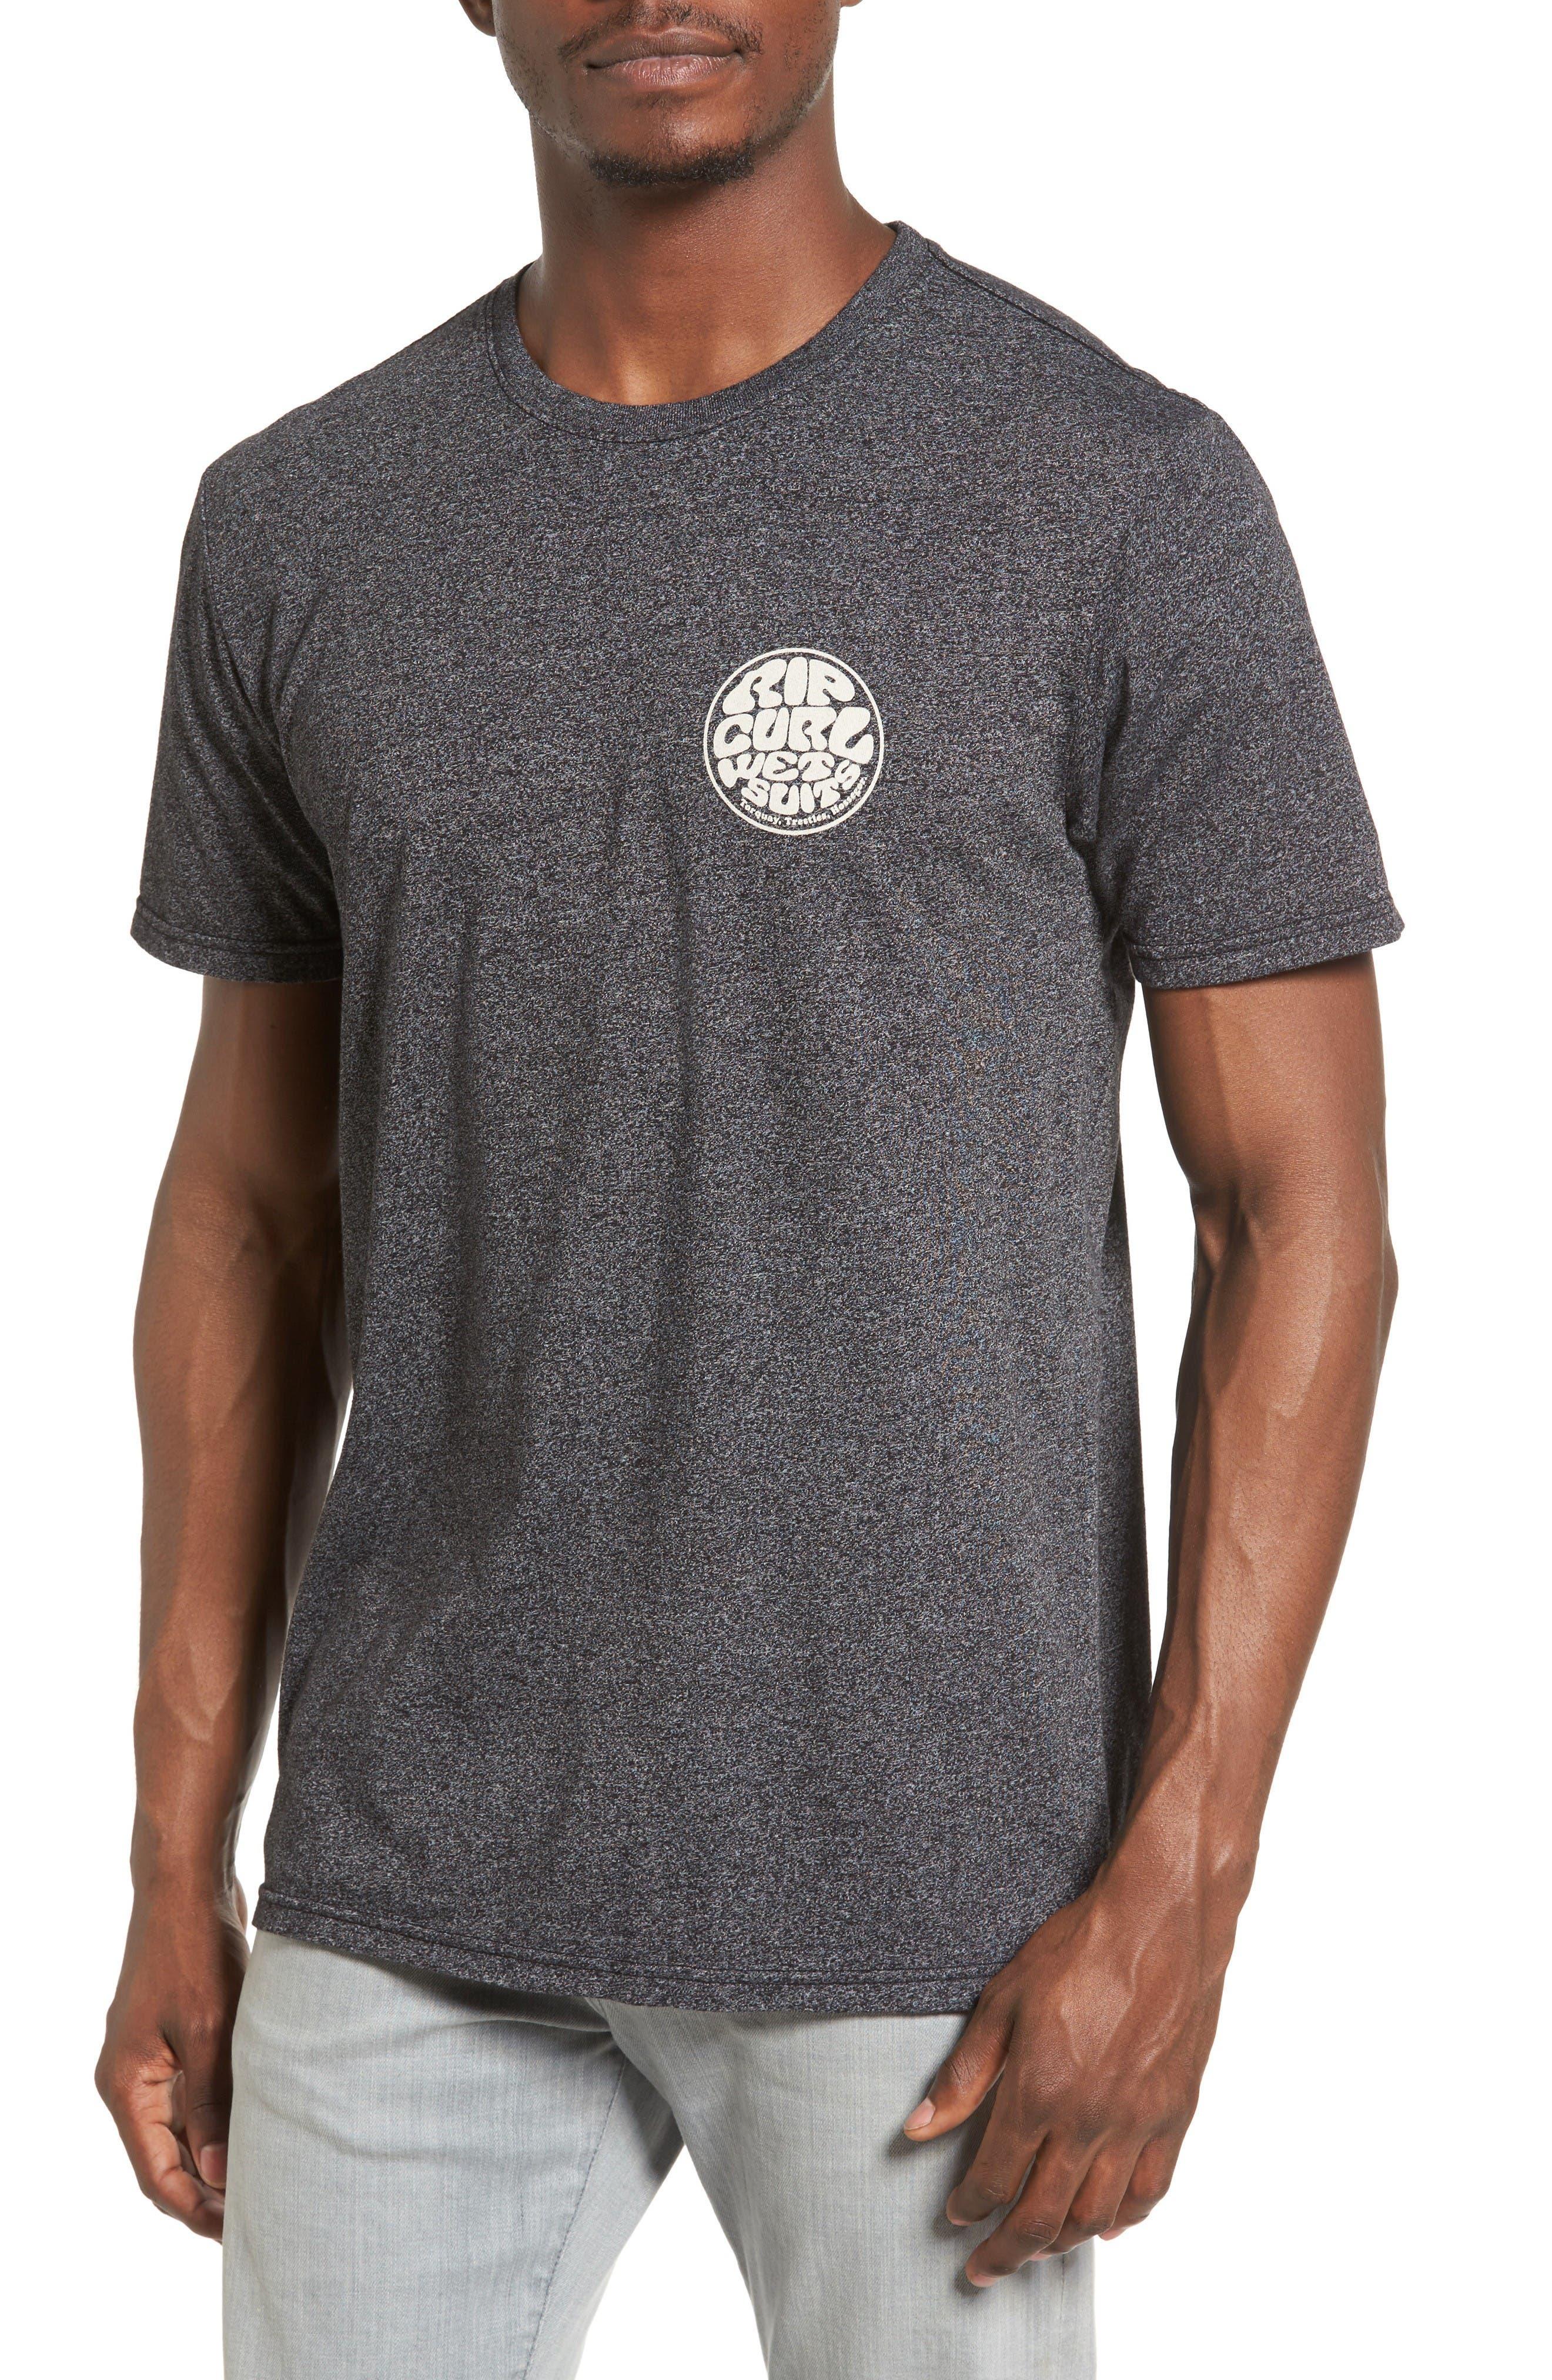 Rip Curl Wettie MF Graphic T-Shirt